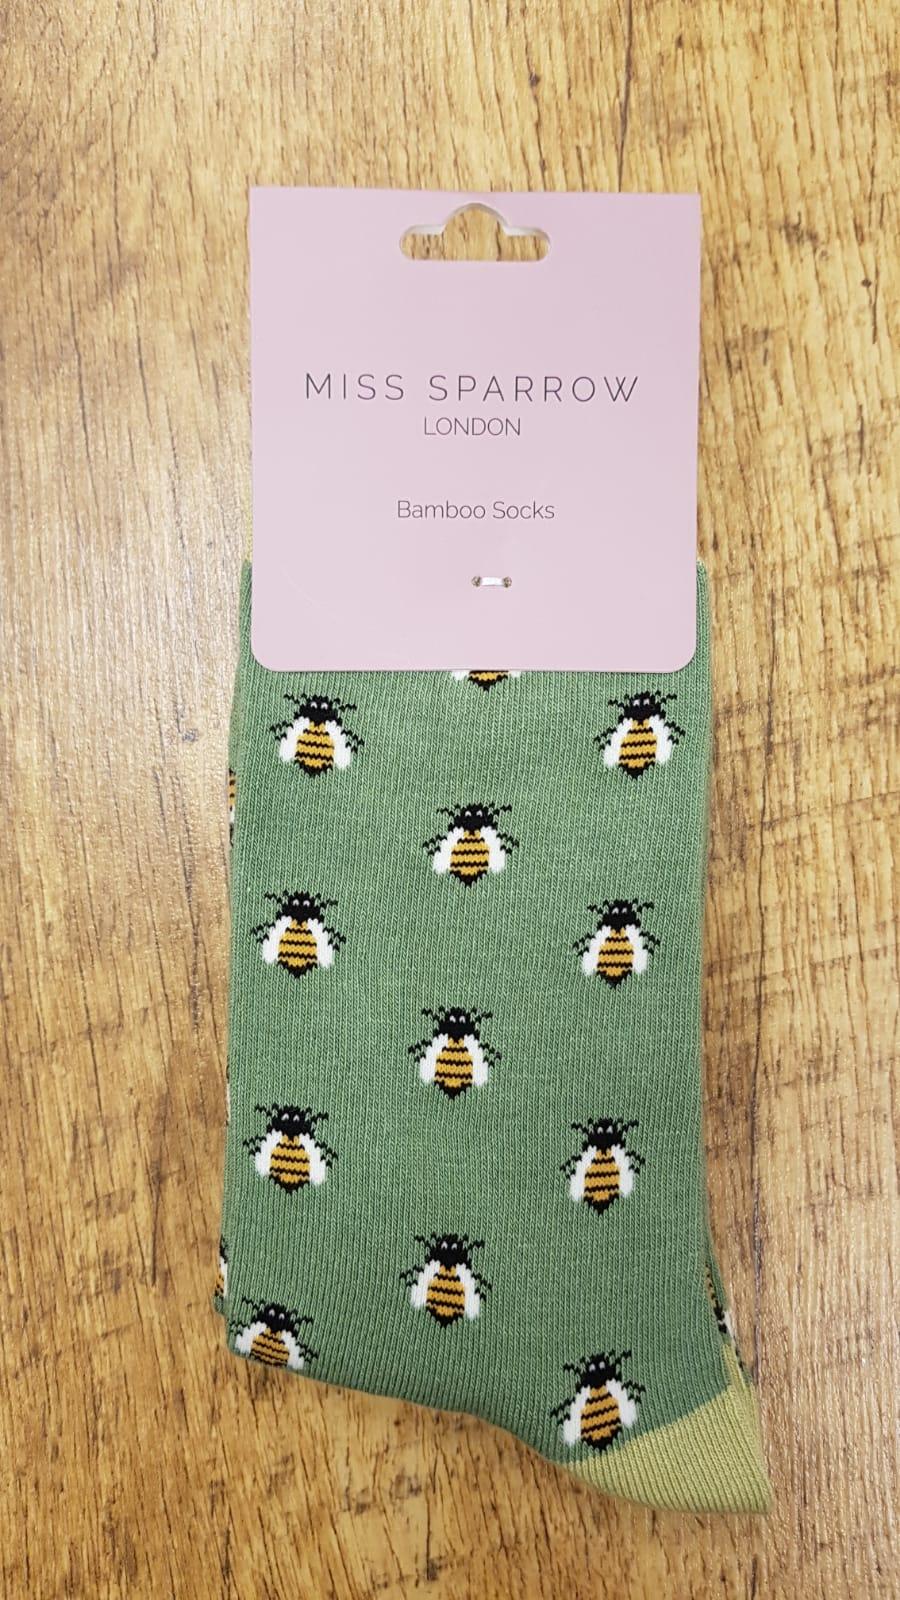 sokken, bamboe, miss sparrow, bjtjes,